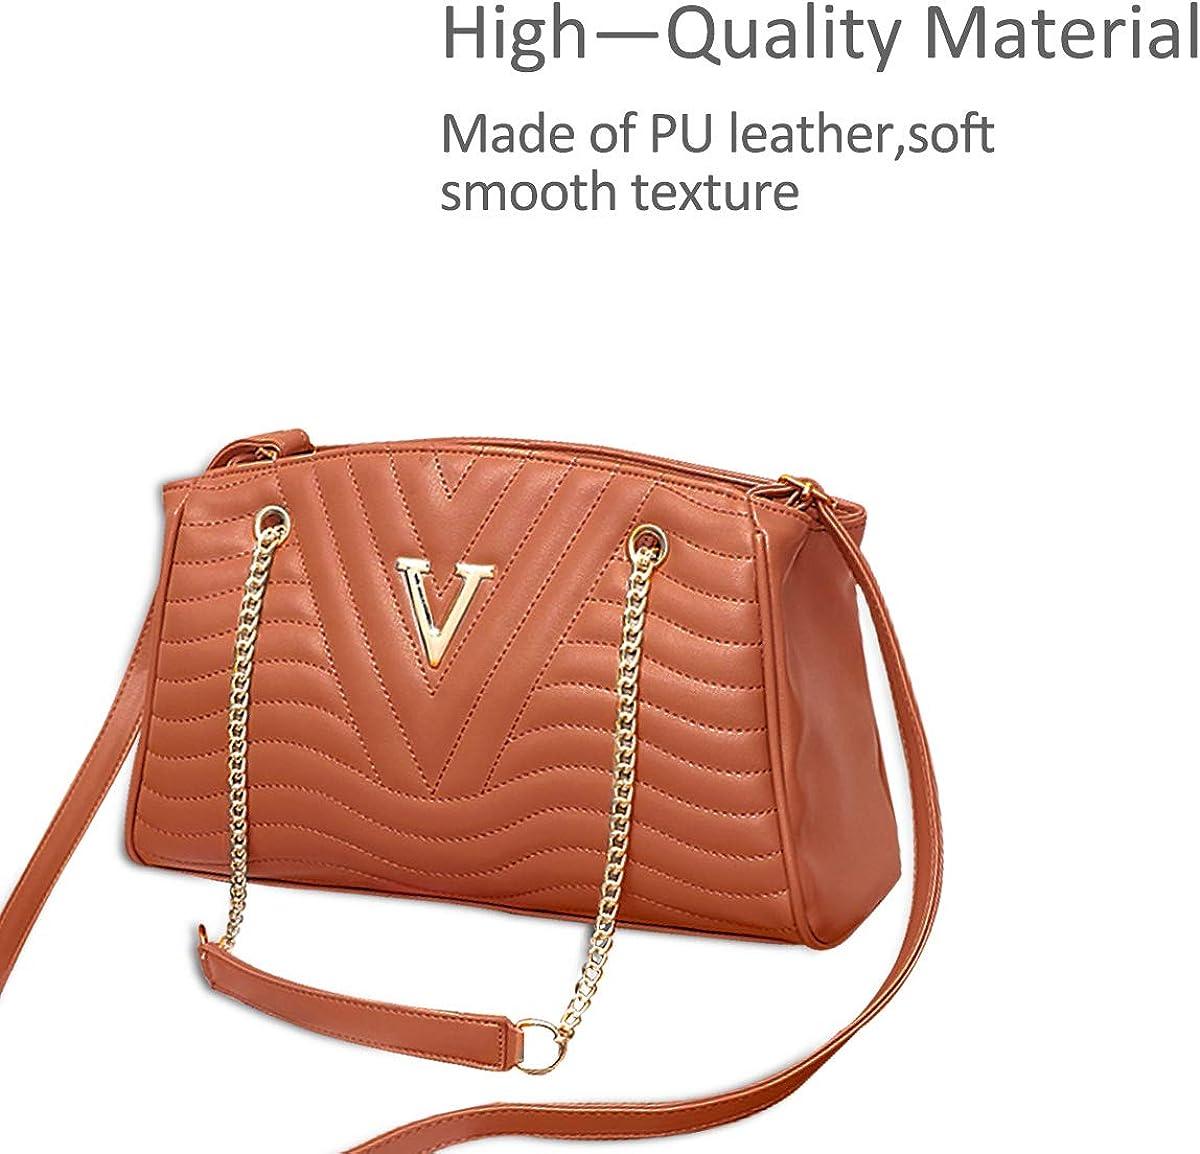 NICOLE /& DORIS Handbags for ladies Quilted Woman Handbags chain shoulder bags fashionable crossbody